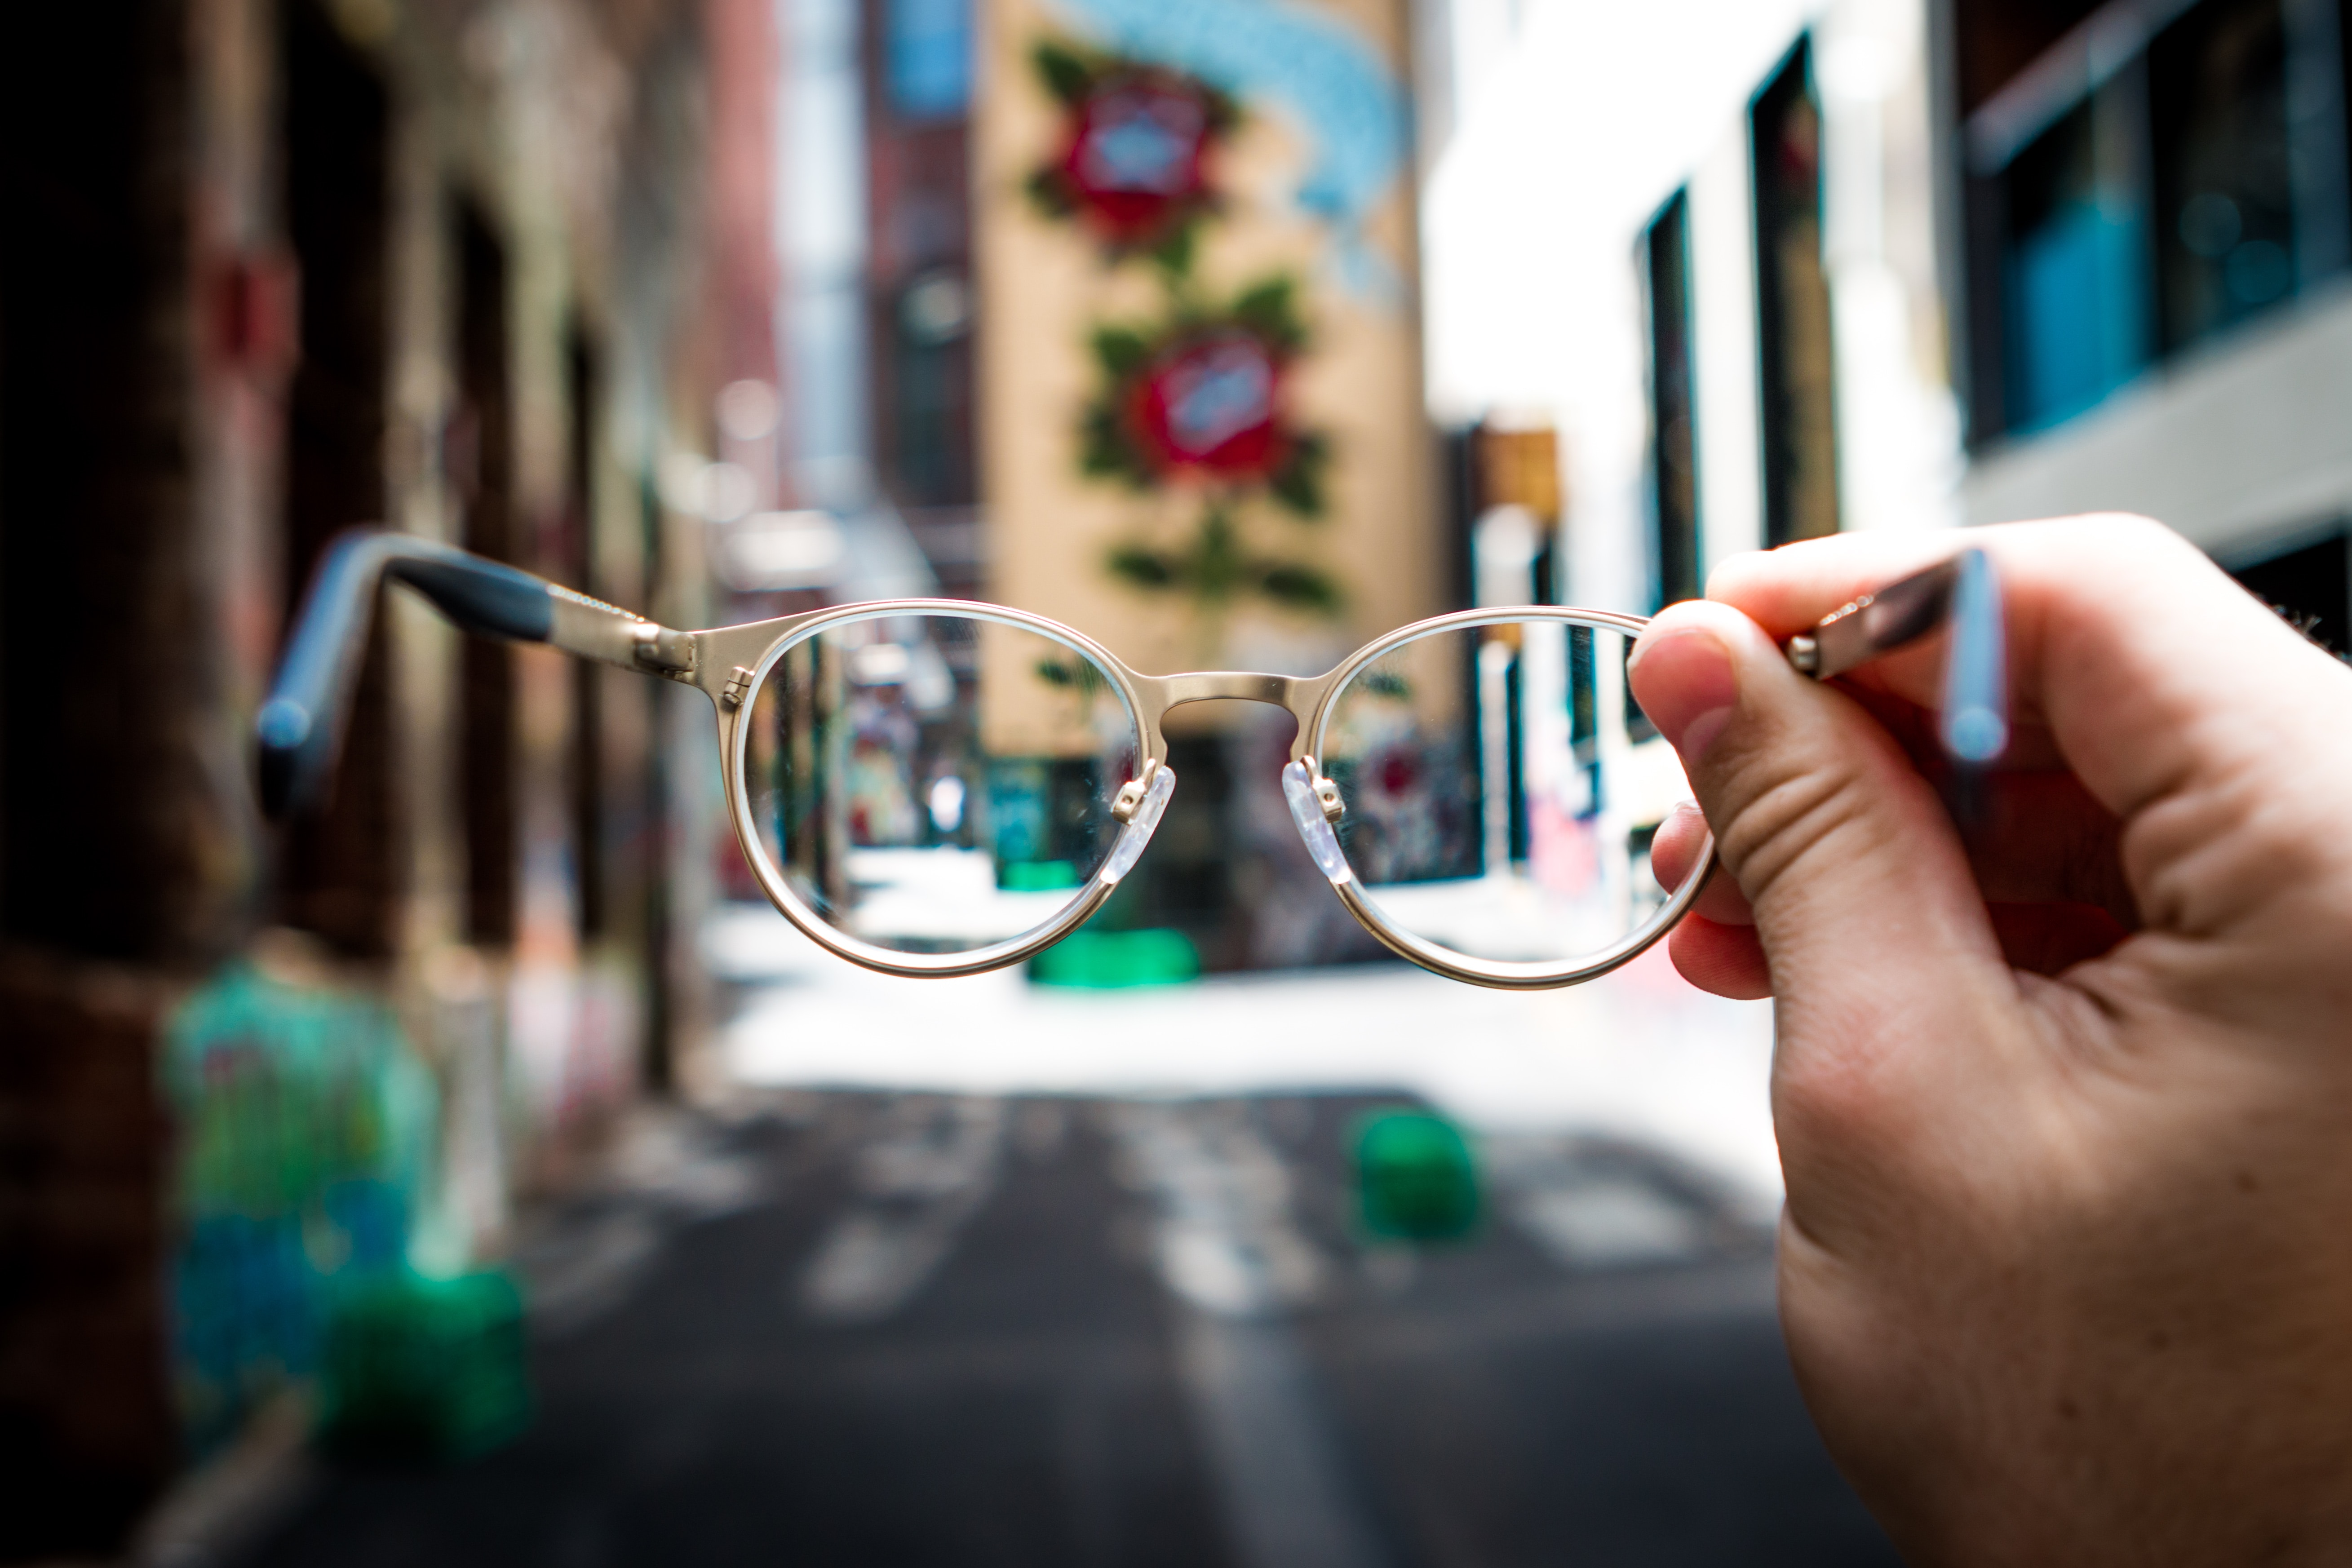 Eyeglasses Held Up Against Background